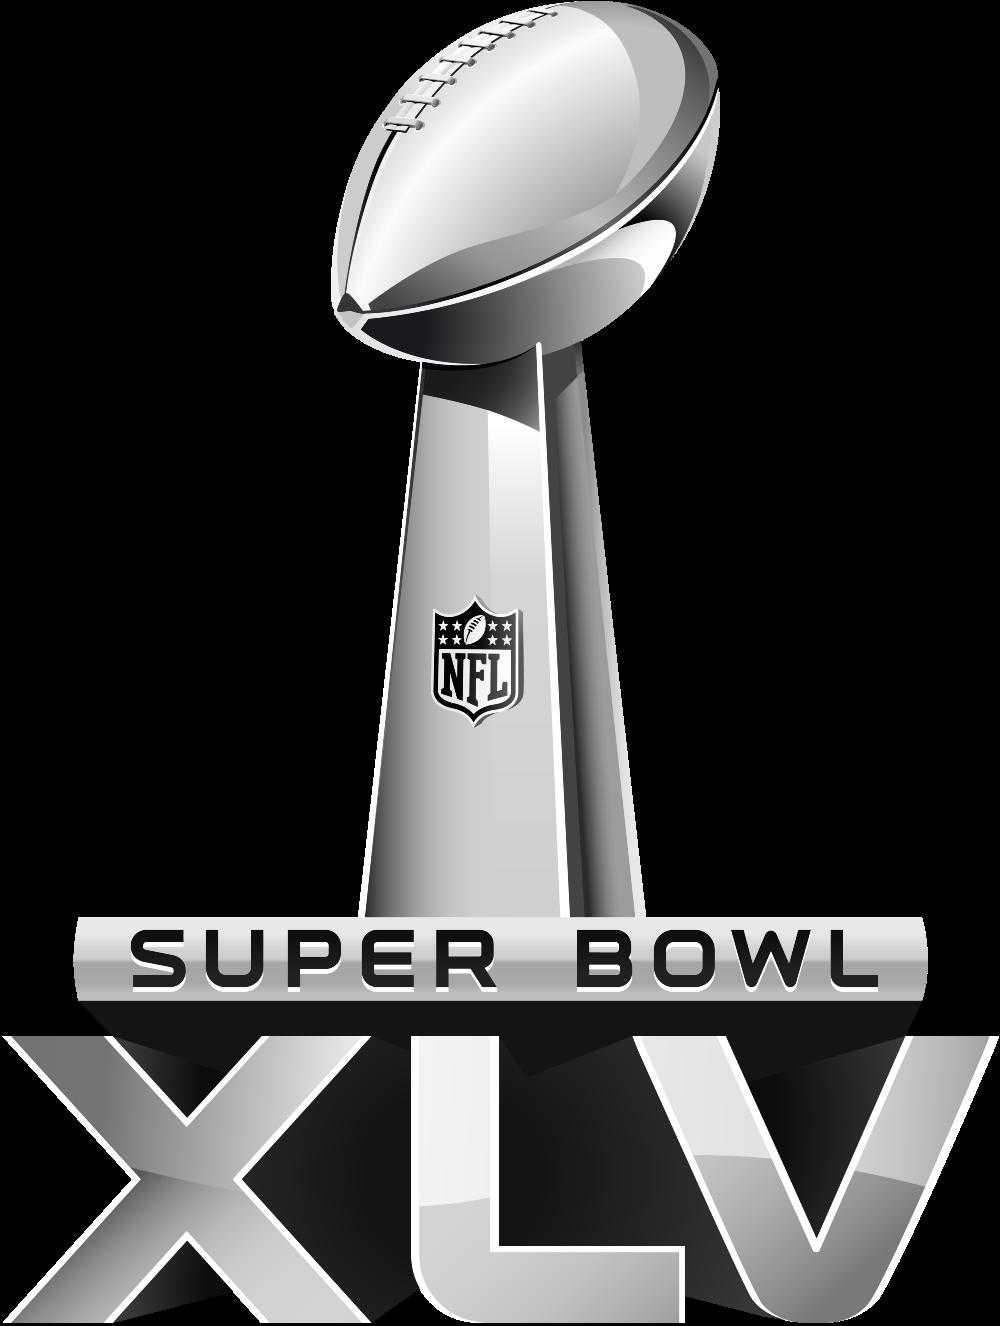 Super Bowl Xlv - Super Bowl Vector, Transparent background PNG HD thumbnail